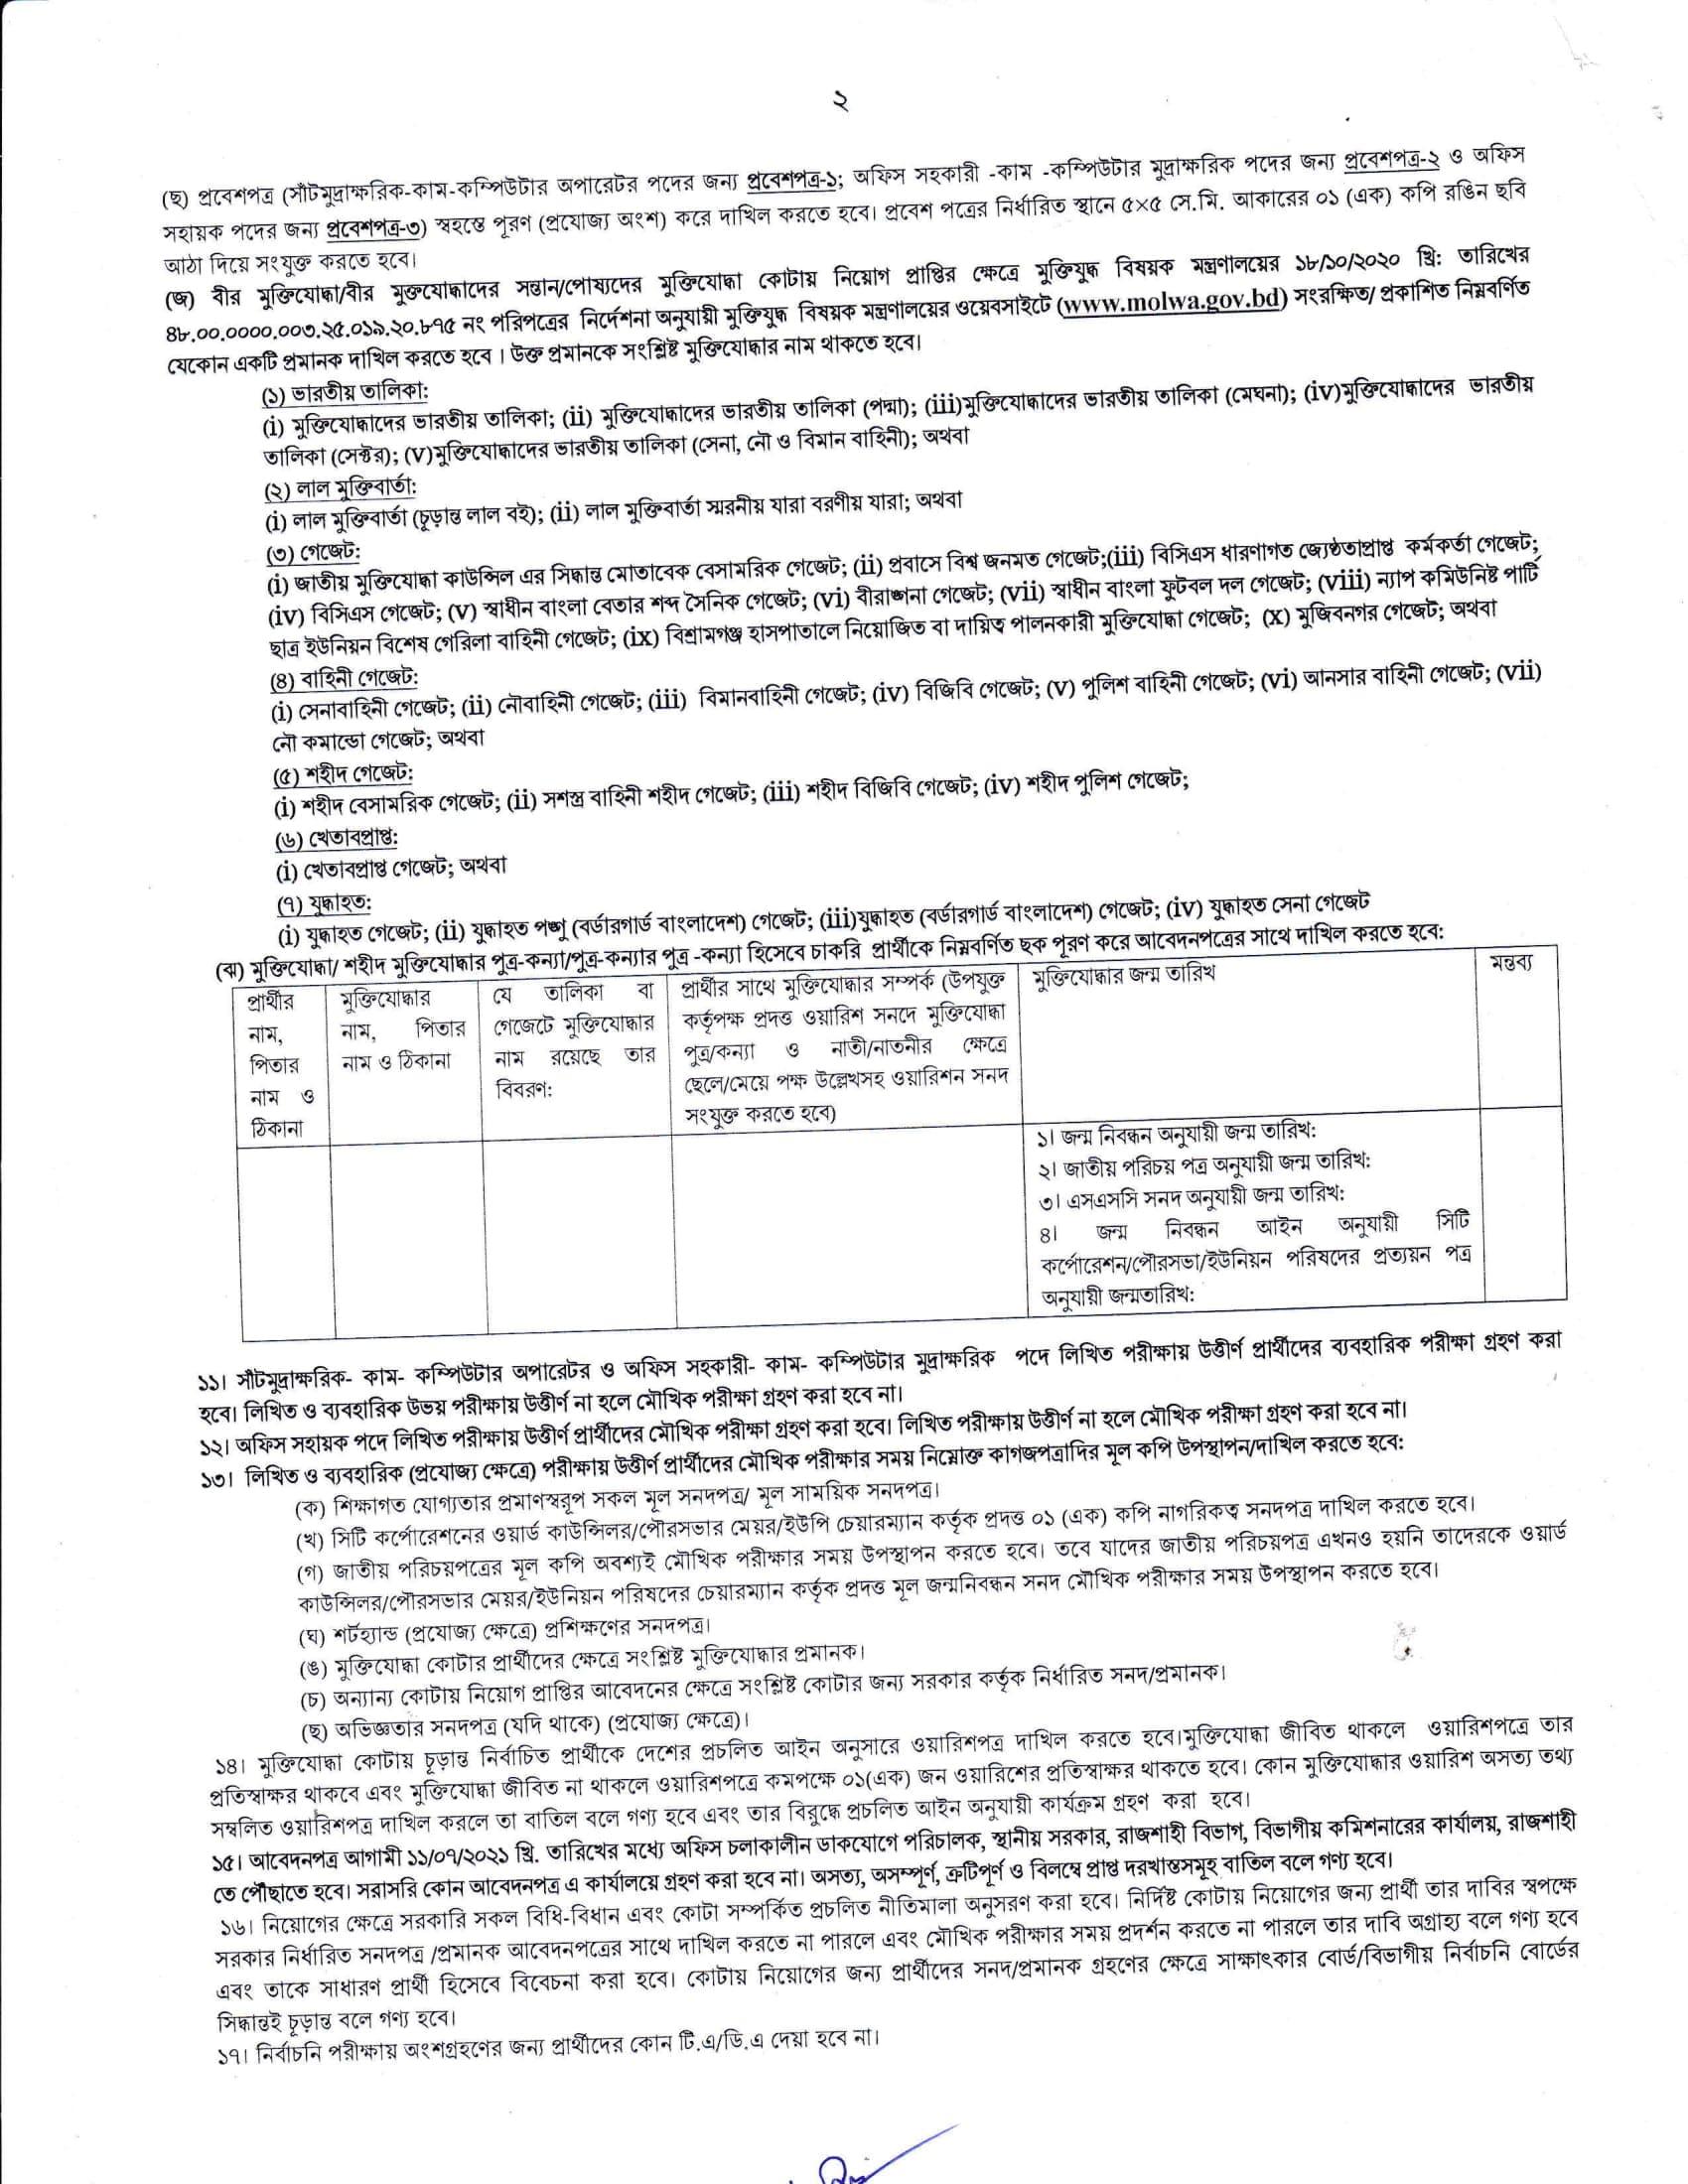 Rajshahi Division Job Circular 2021 - www.rajshahidiv.gov.bd